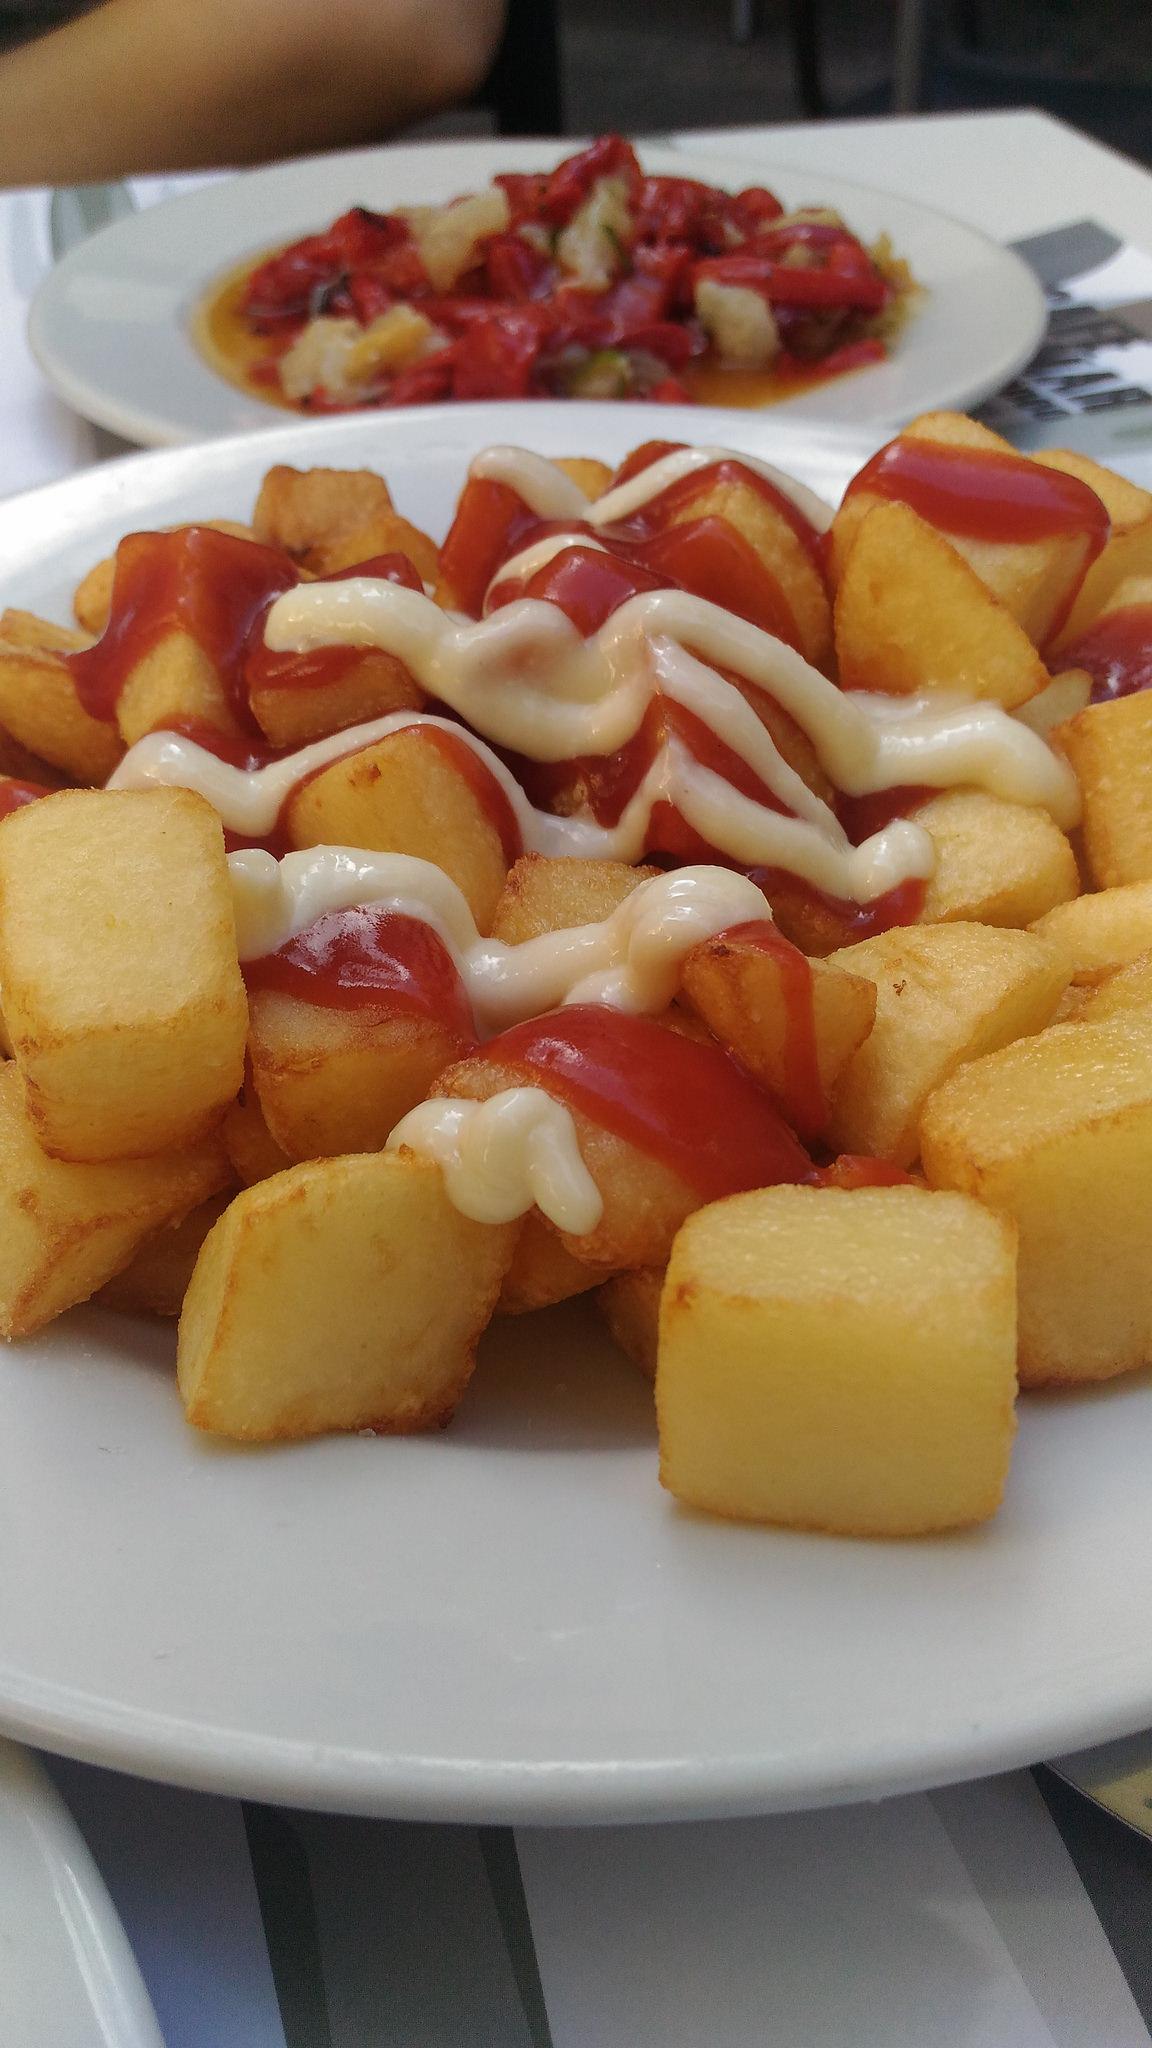 Patatas Bravas (Fried Potatoes in Spicy Tomato Sauce )